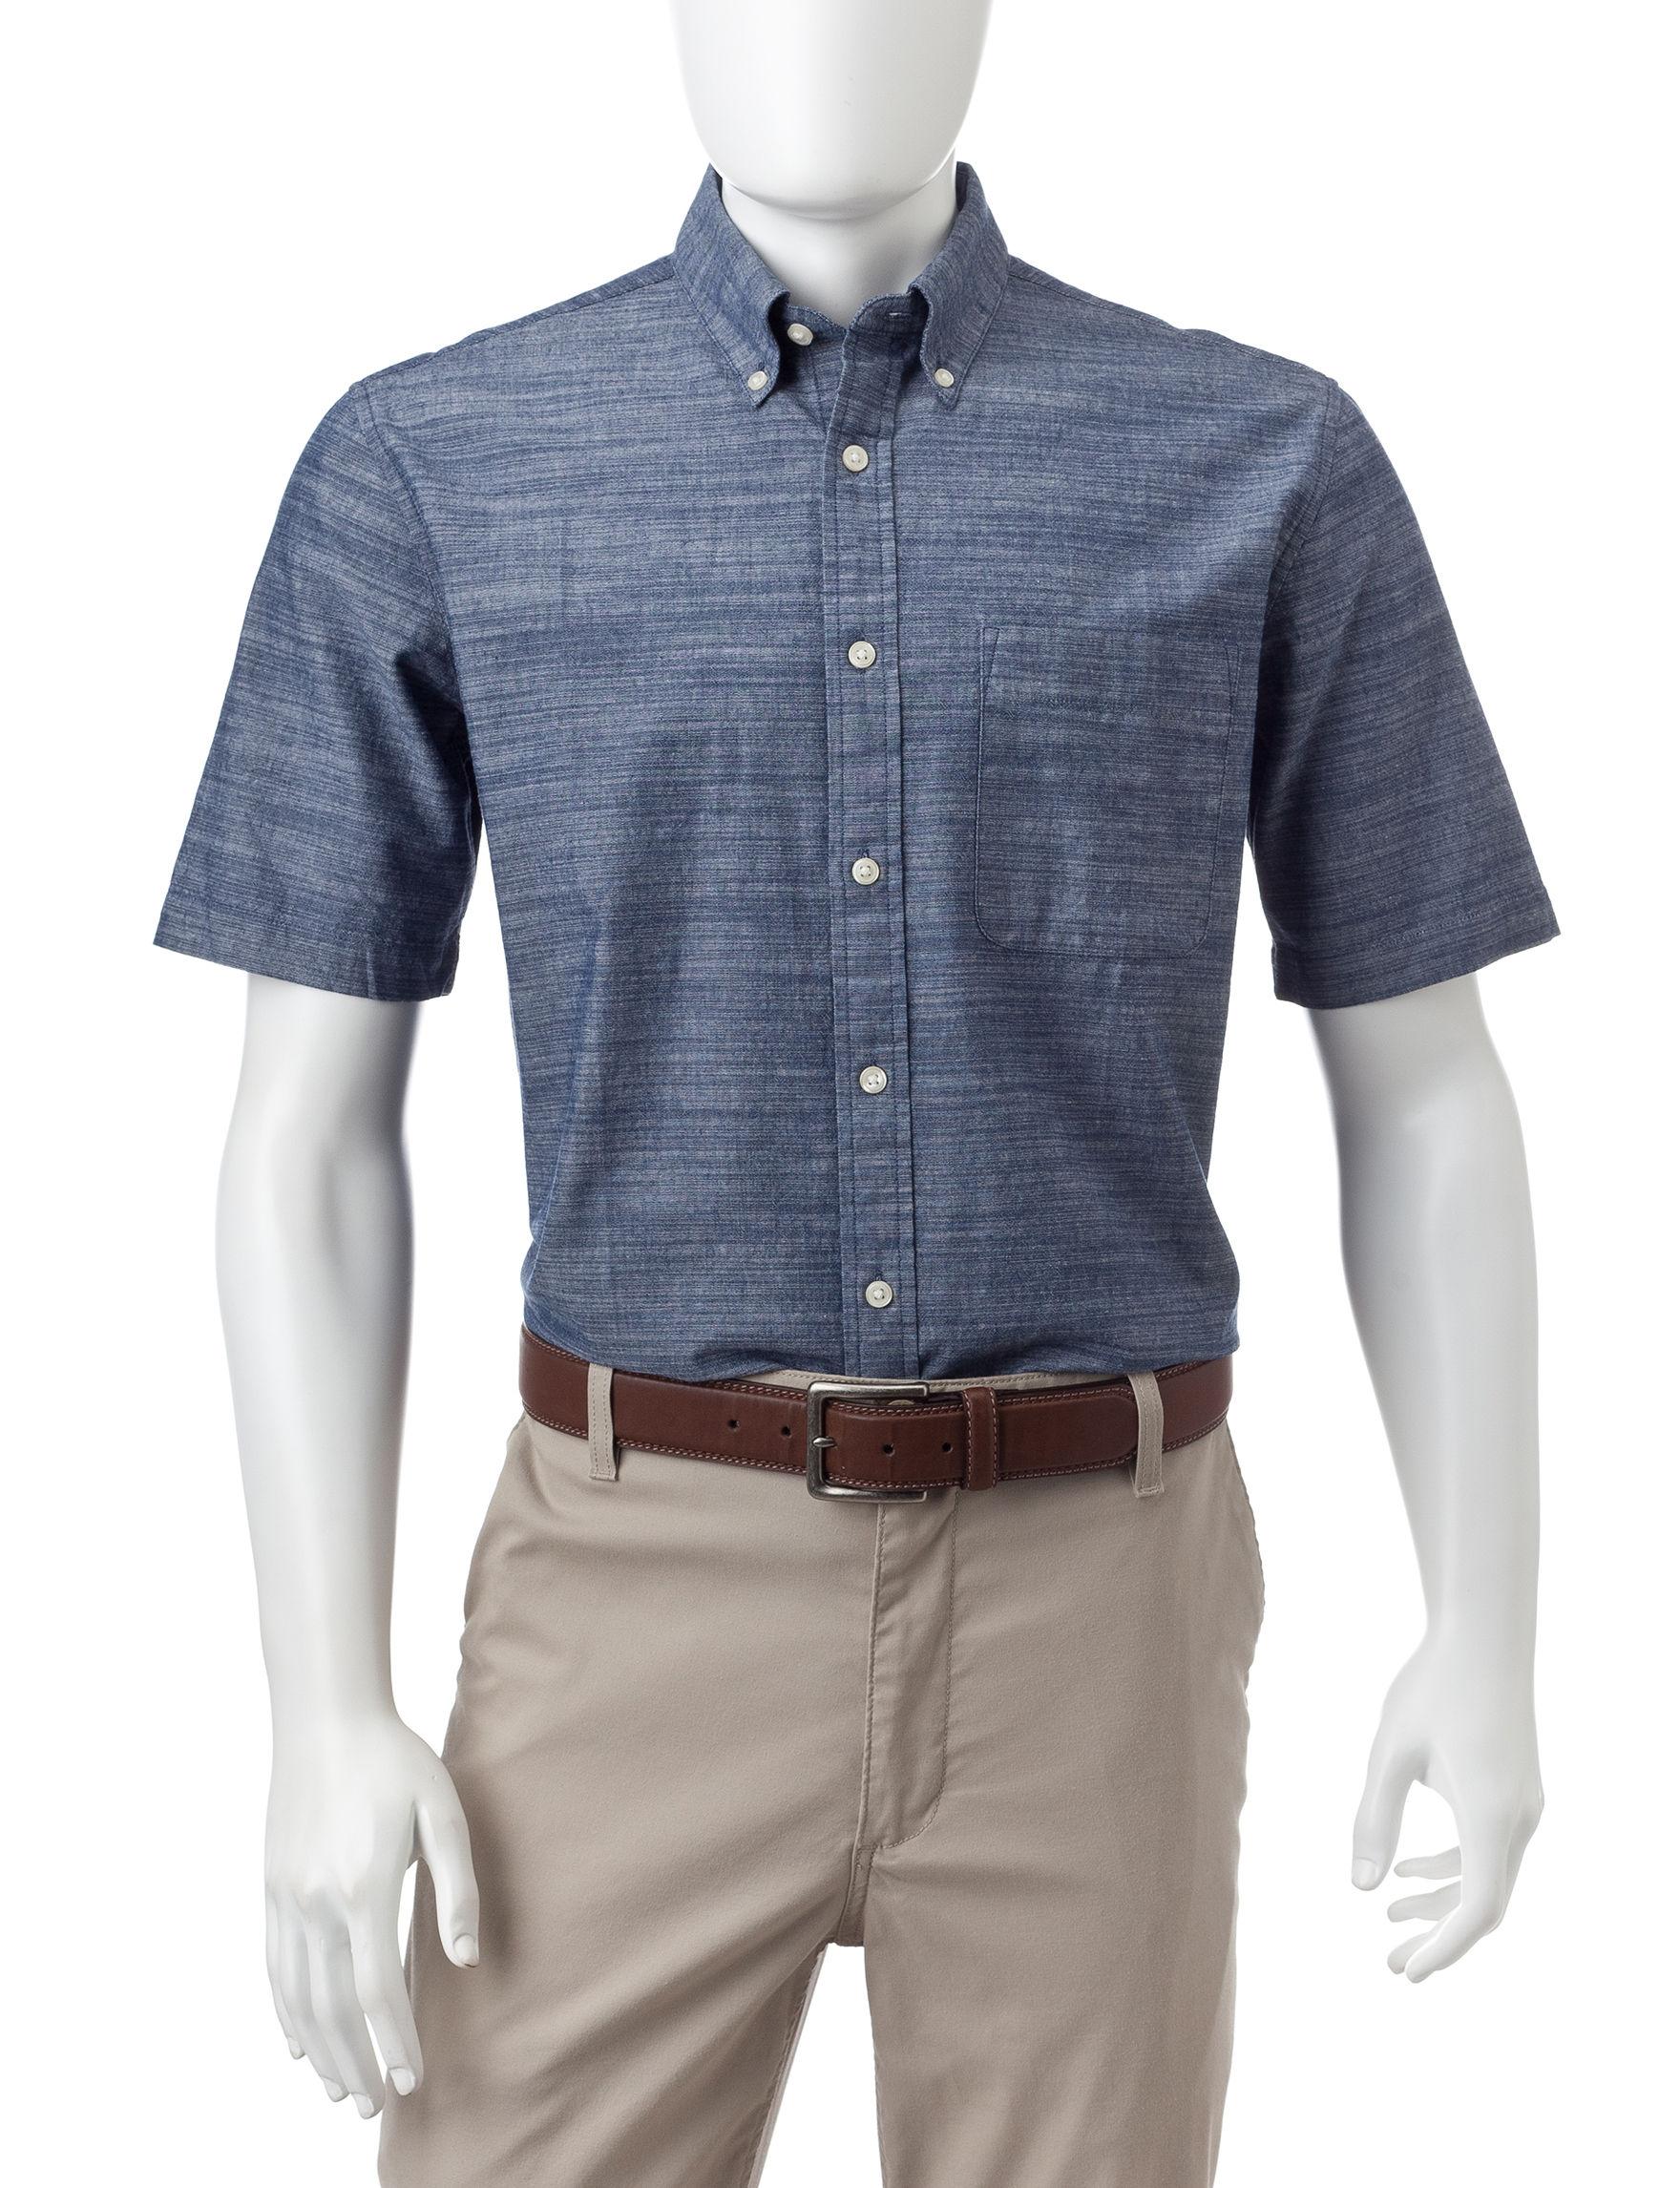 Sun River Dark Blue Casual Button Down Shirts